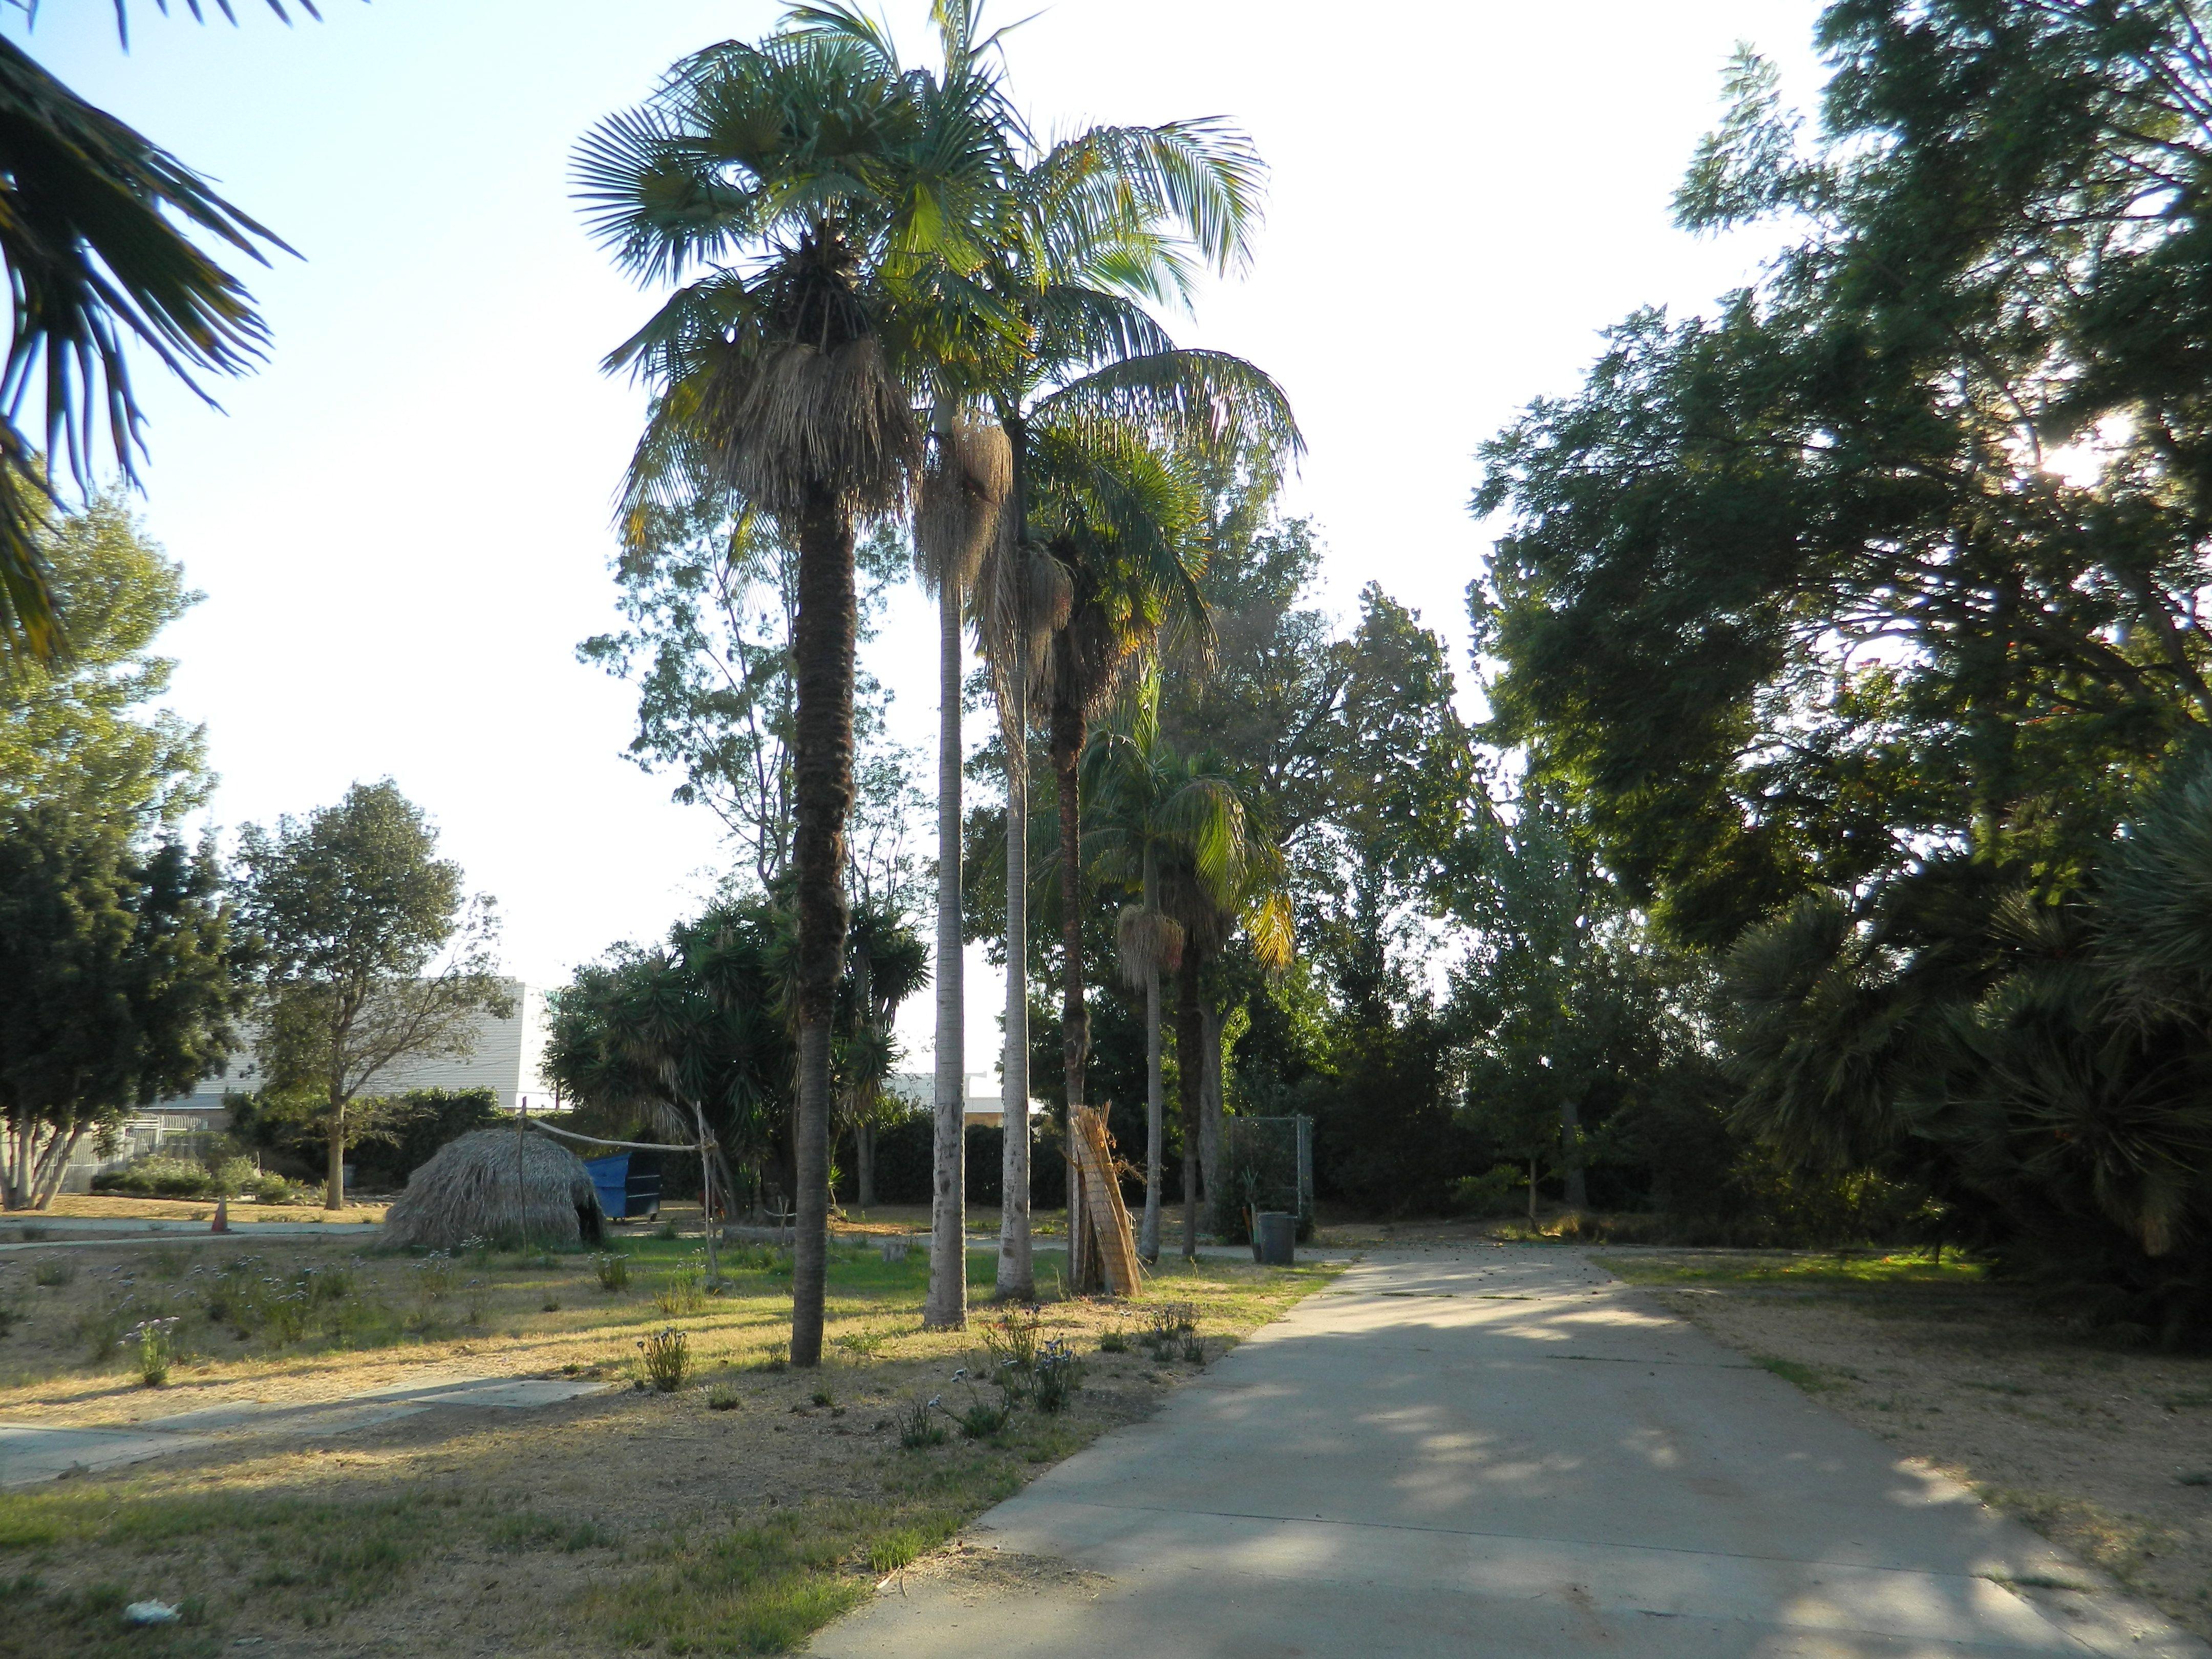 Historic landmark at University High School, Los Angeles, California, United States; featuring Chumash-style 'Ap hut